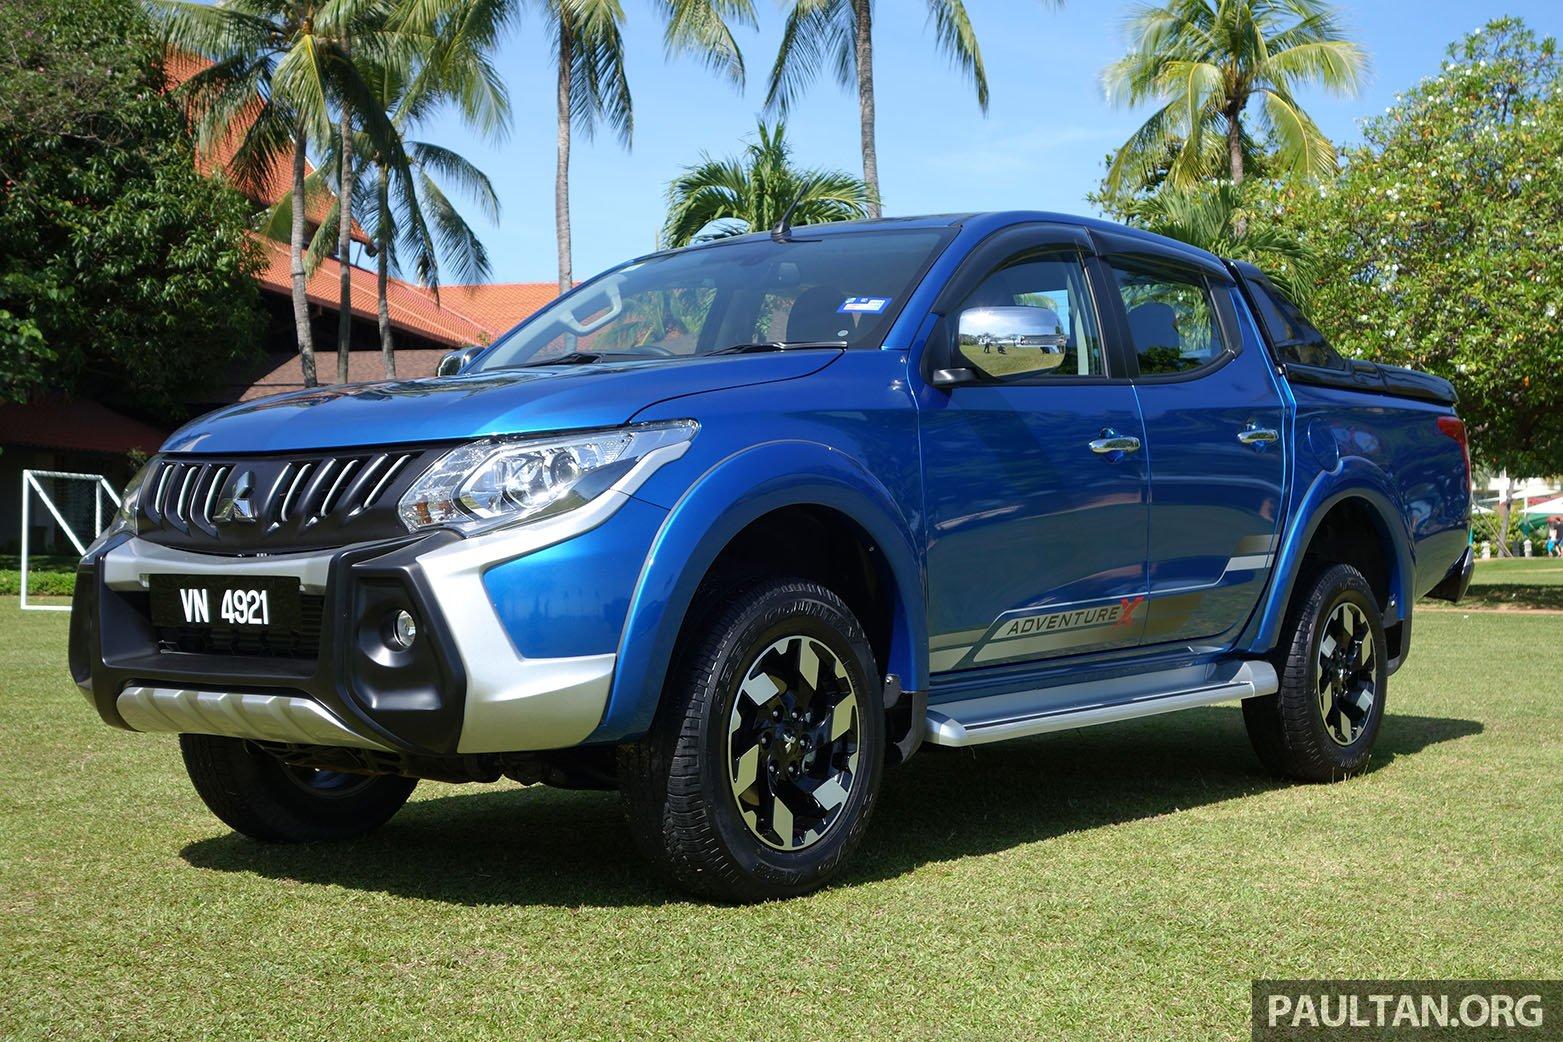 DRIVEN: 2017 Mitsubishi Triton VGT Malaysia Review